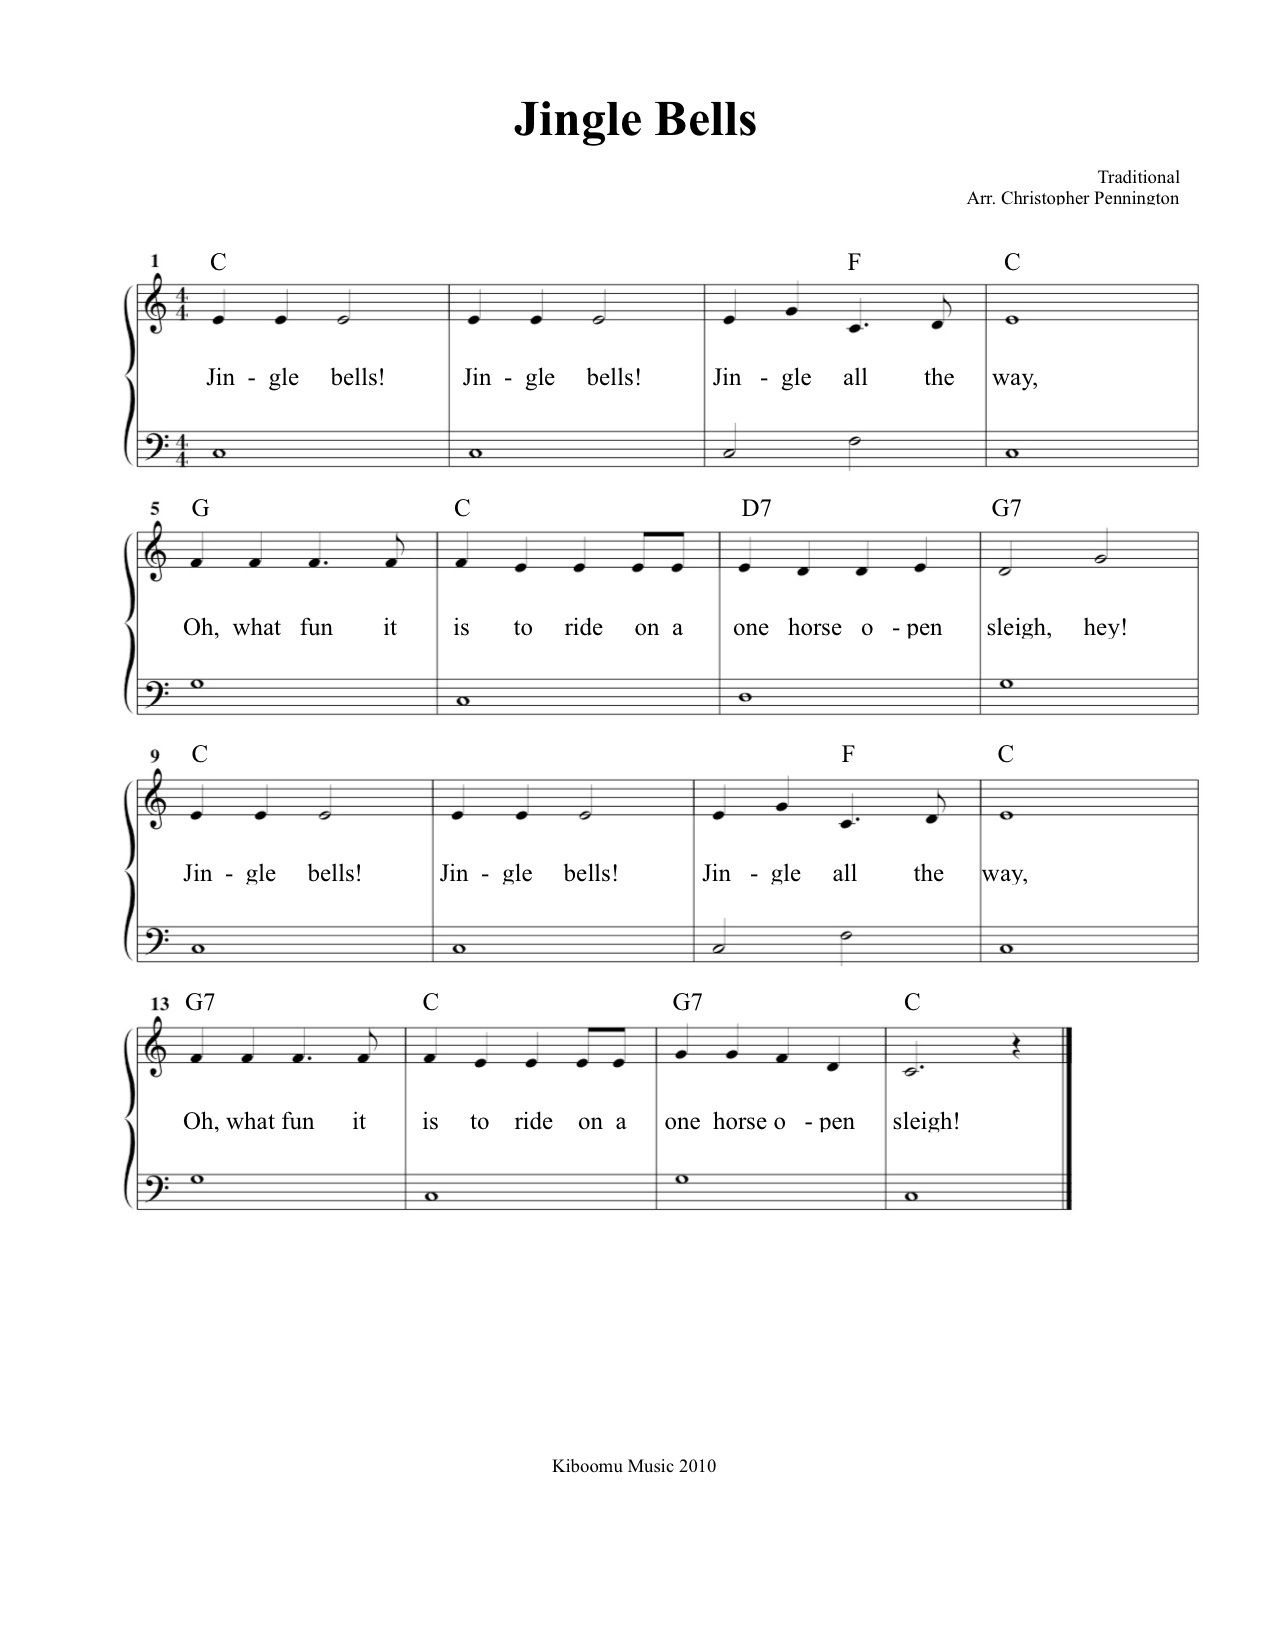 Free Printable Jingle Bells Sheet Music And Song For Kids!   Piano - Christmas Songs Piano Sheet Music Free Printable